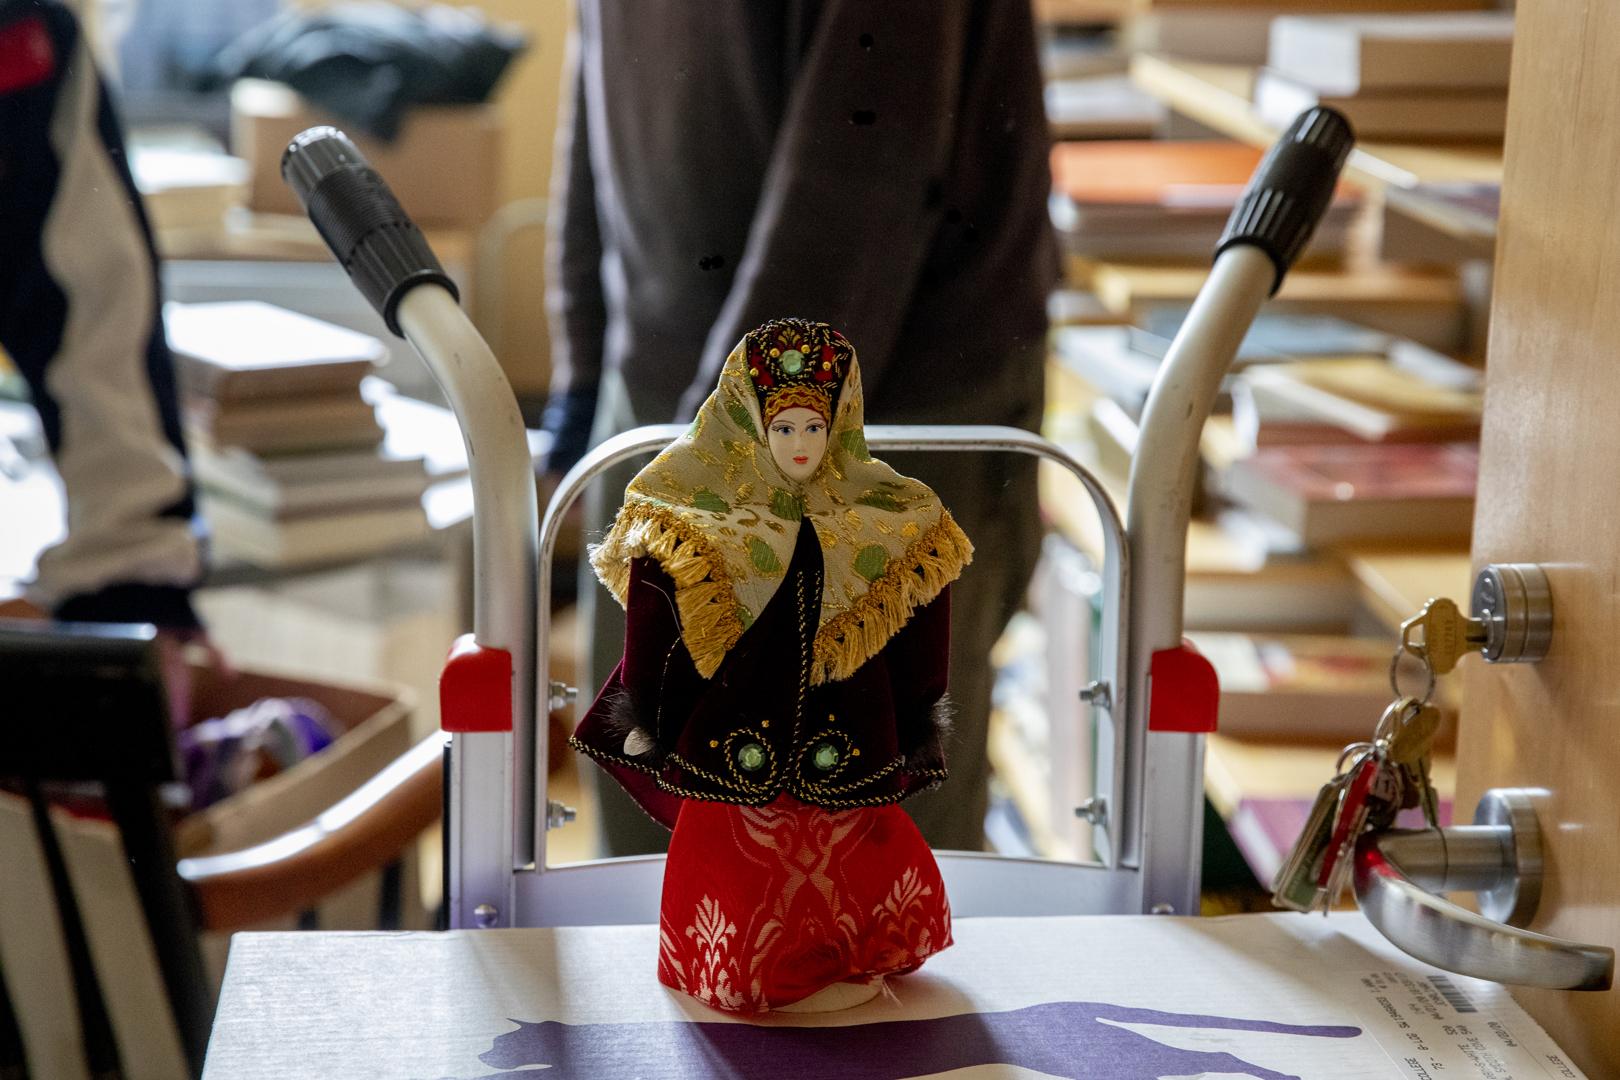 A Russian keepsake awaits packing. (Phyllis Graber Jensen/Bates College)